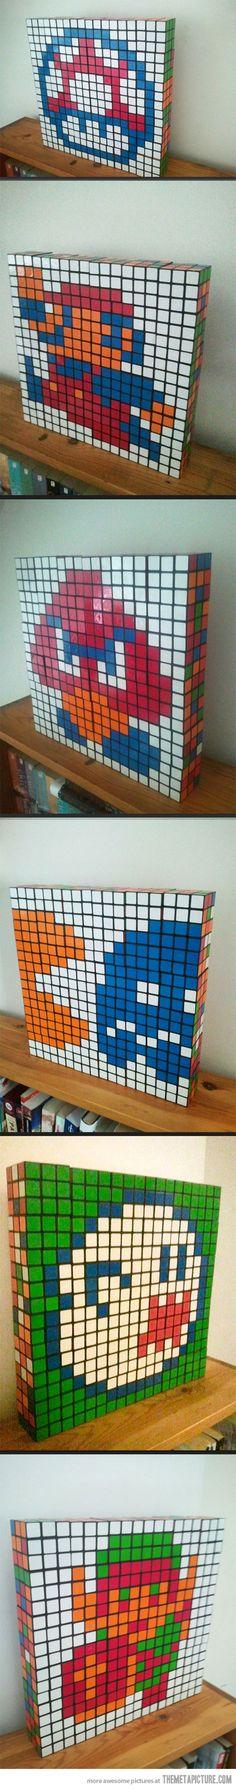 Rubik's Cupe Pixel Art